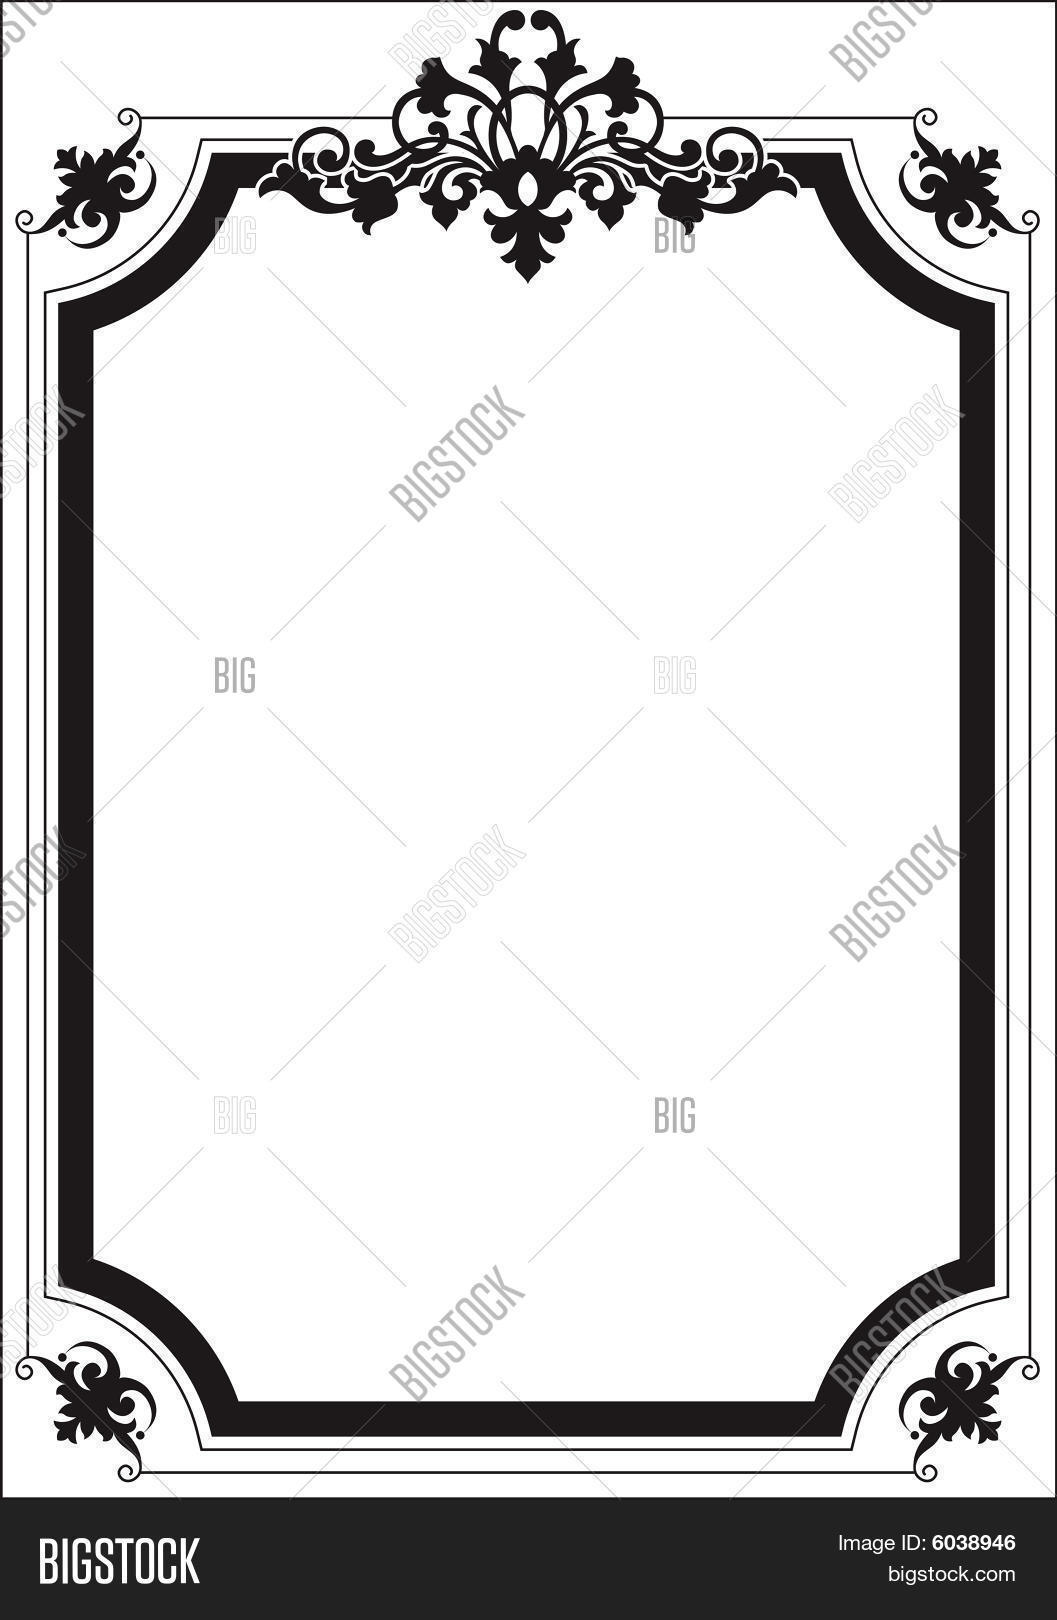 Scroll Border Frame Vector & Photo (Free Trial) | Bigstock